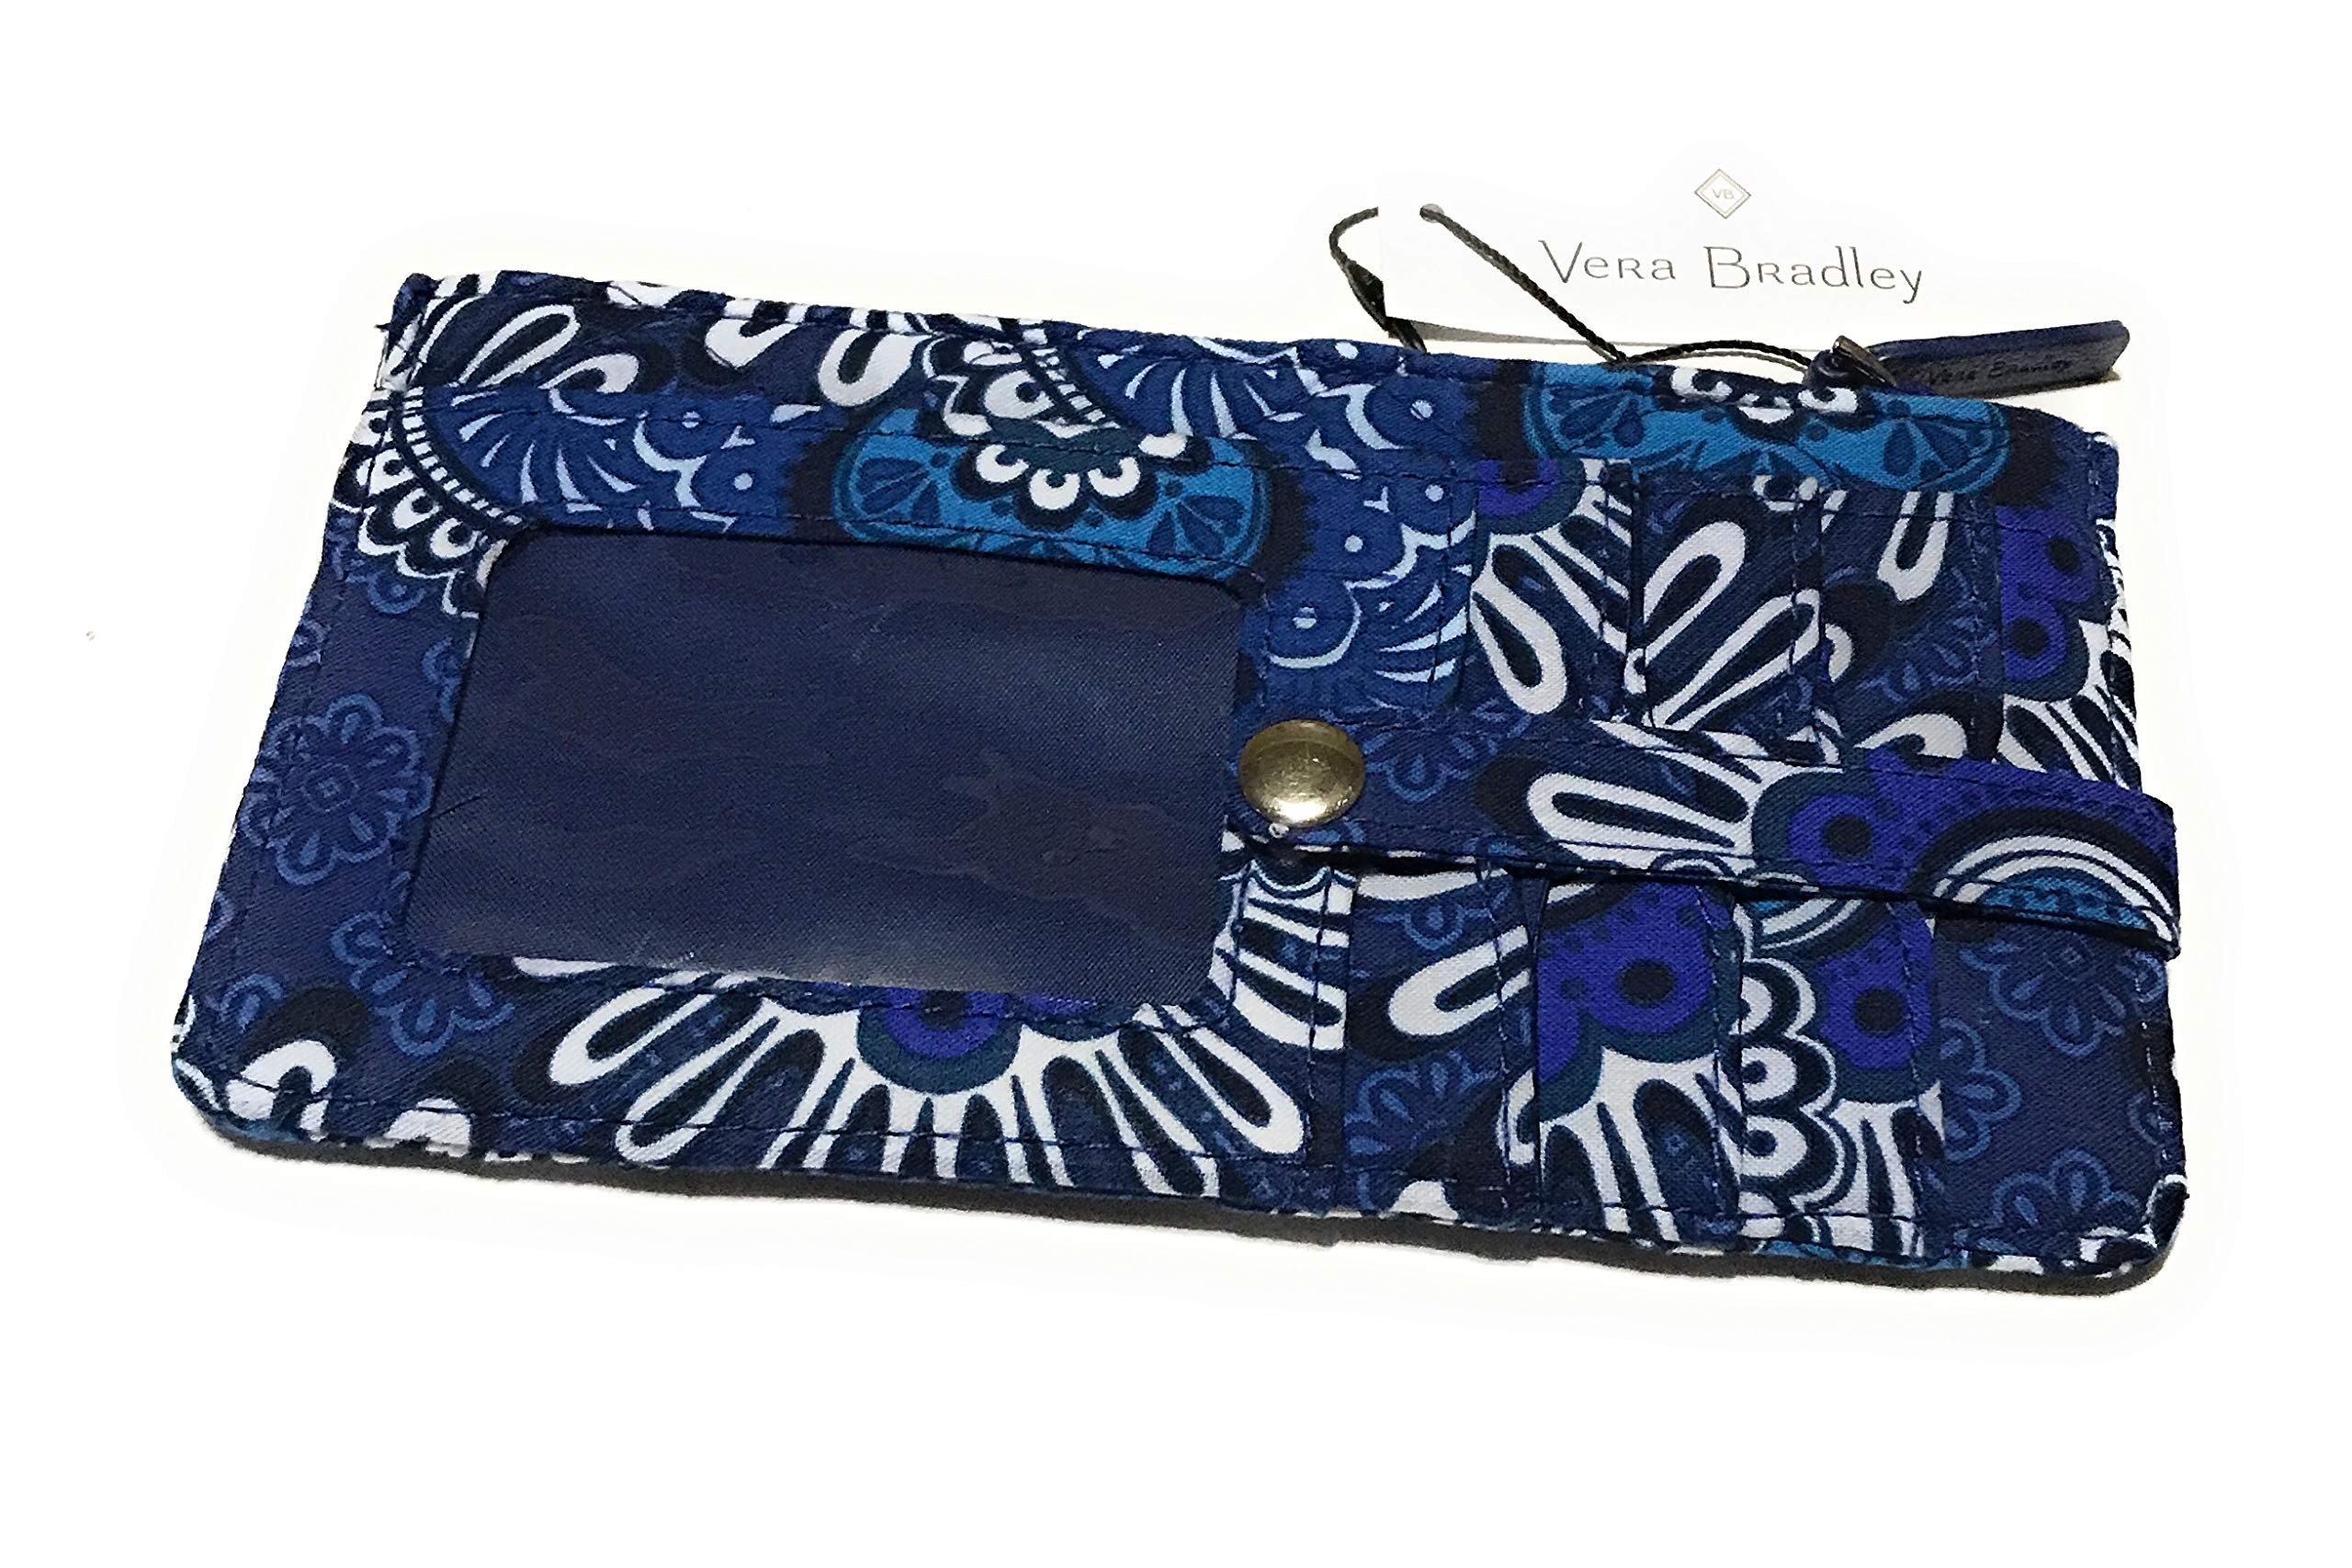 Vera Bradley Ultimate Card Case - Blue Tapestry by Vera Bradley